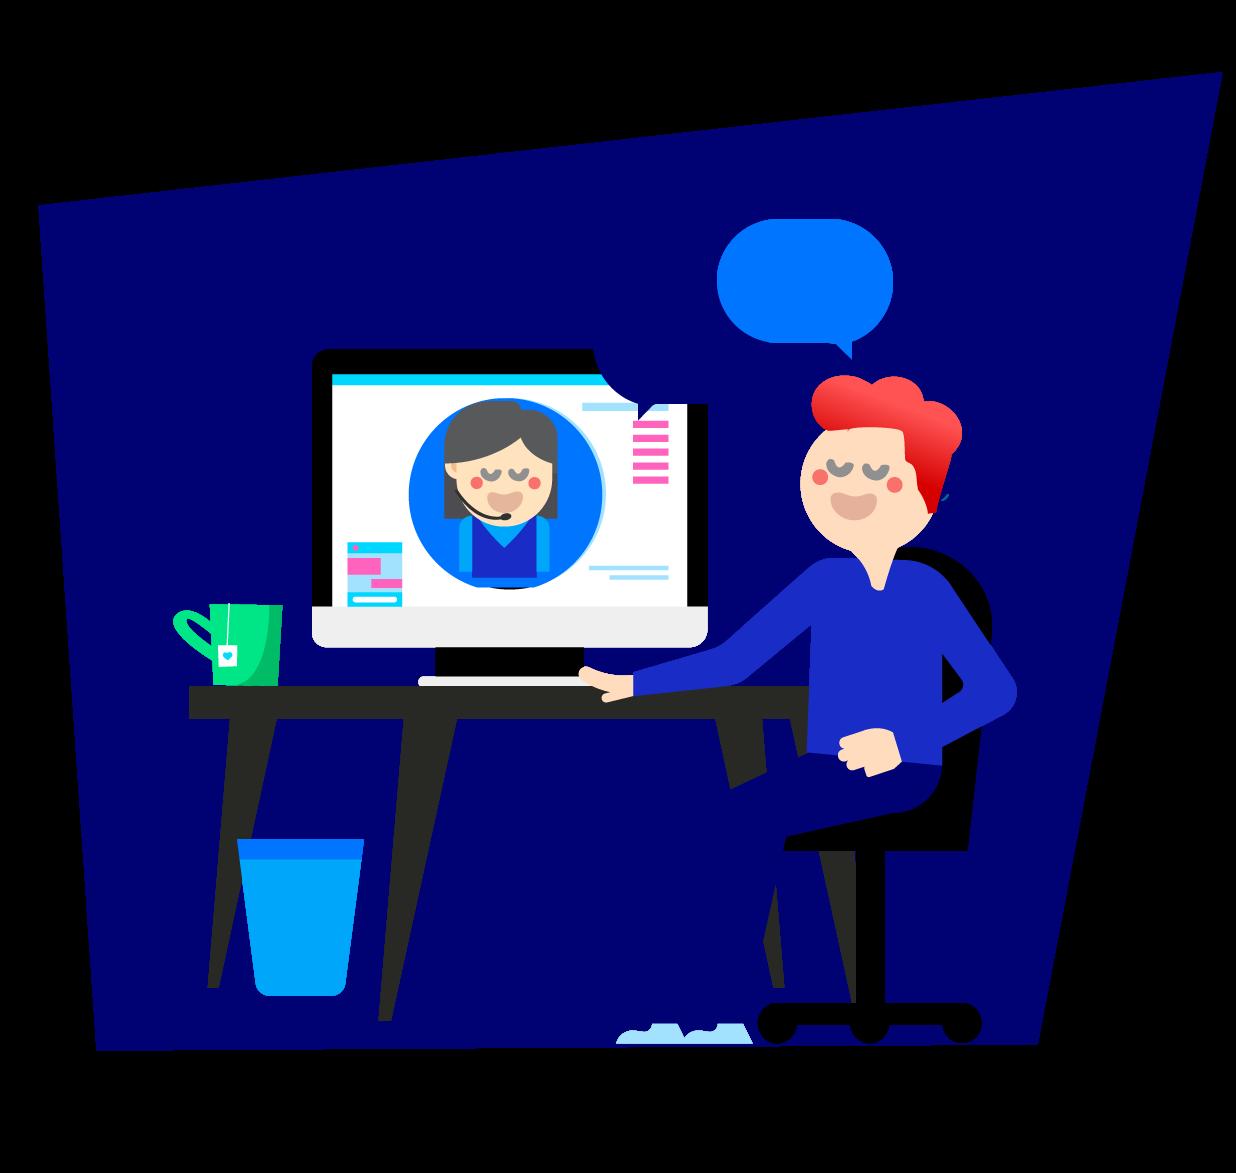 Recognize customer service agents - Playvox